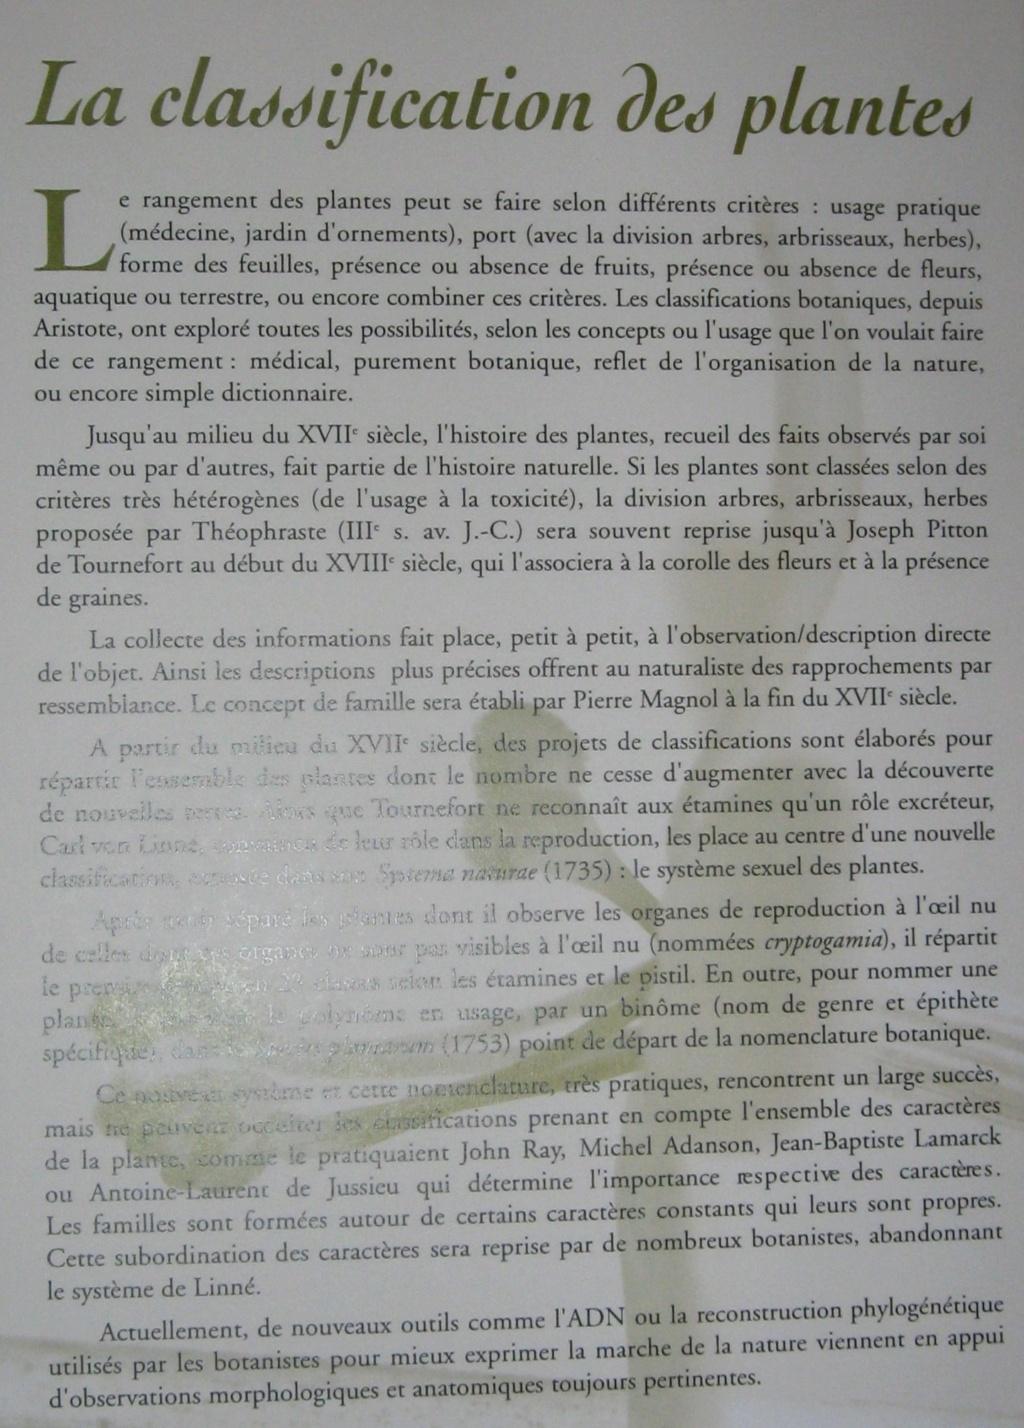 Les botanistes  - Page 3 Balagu16